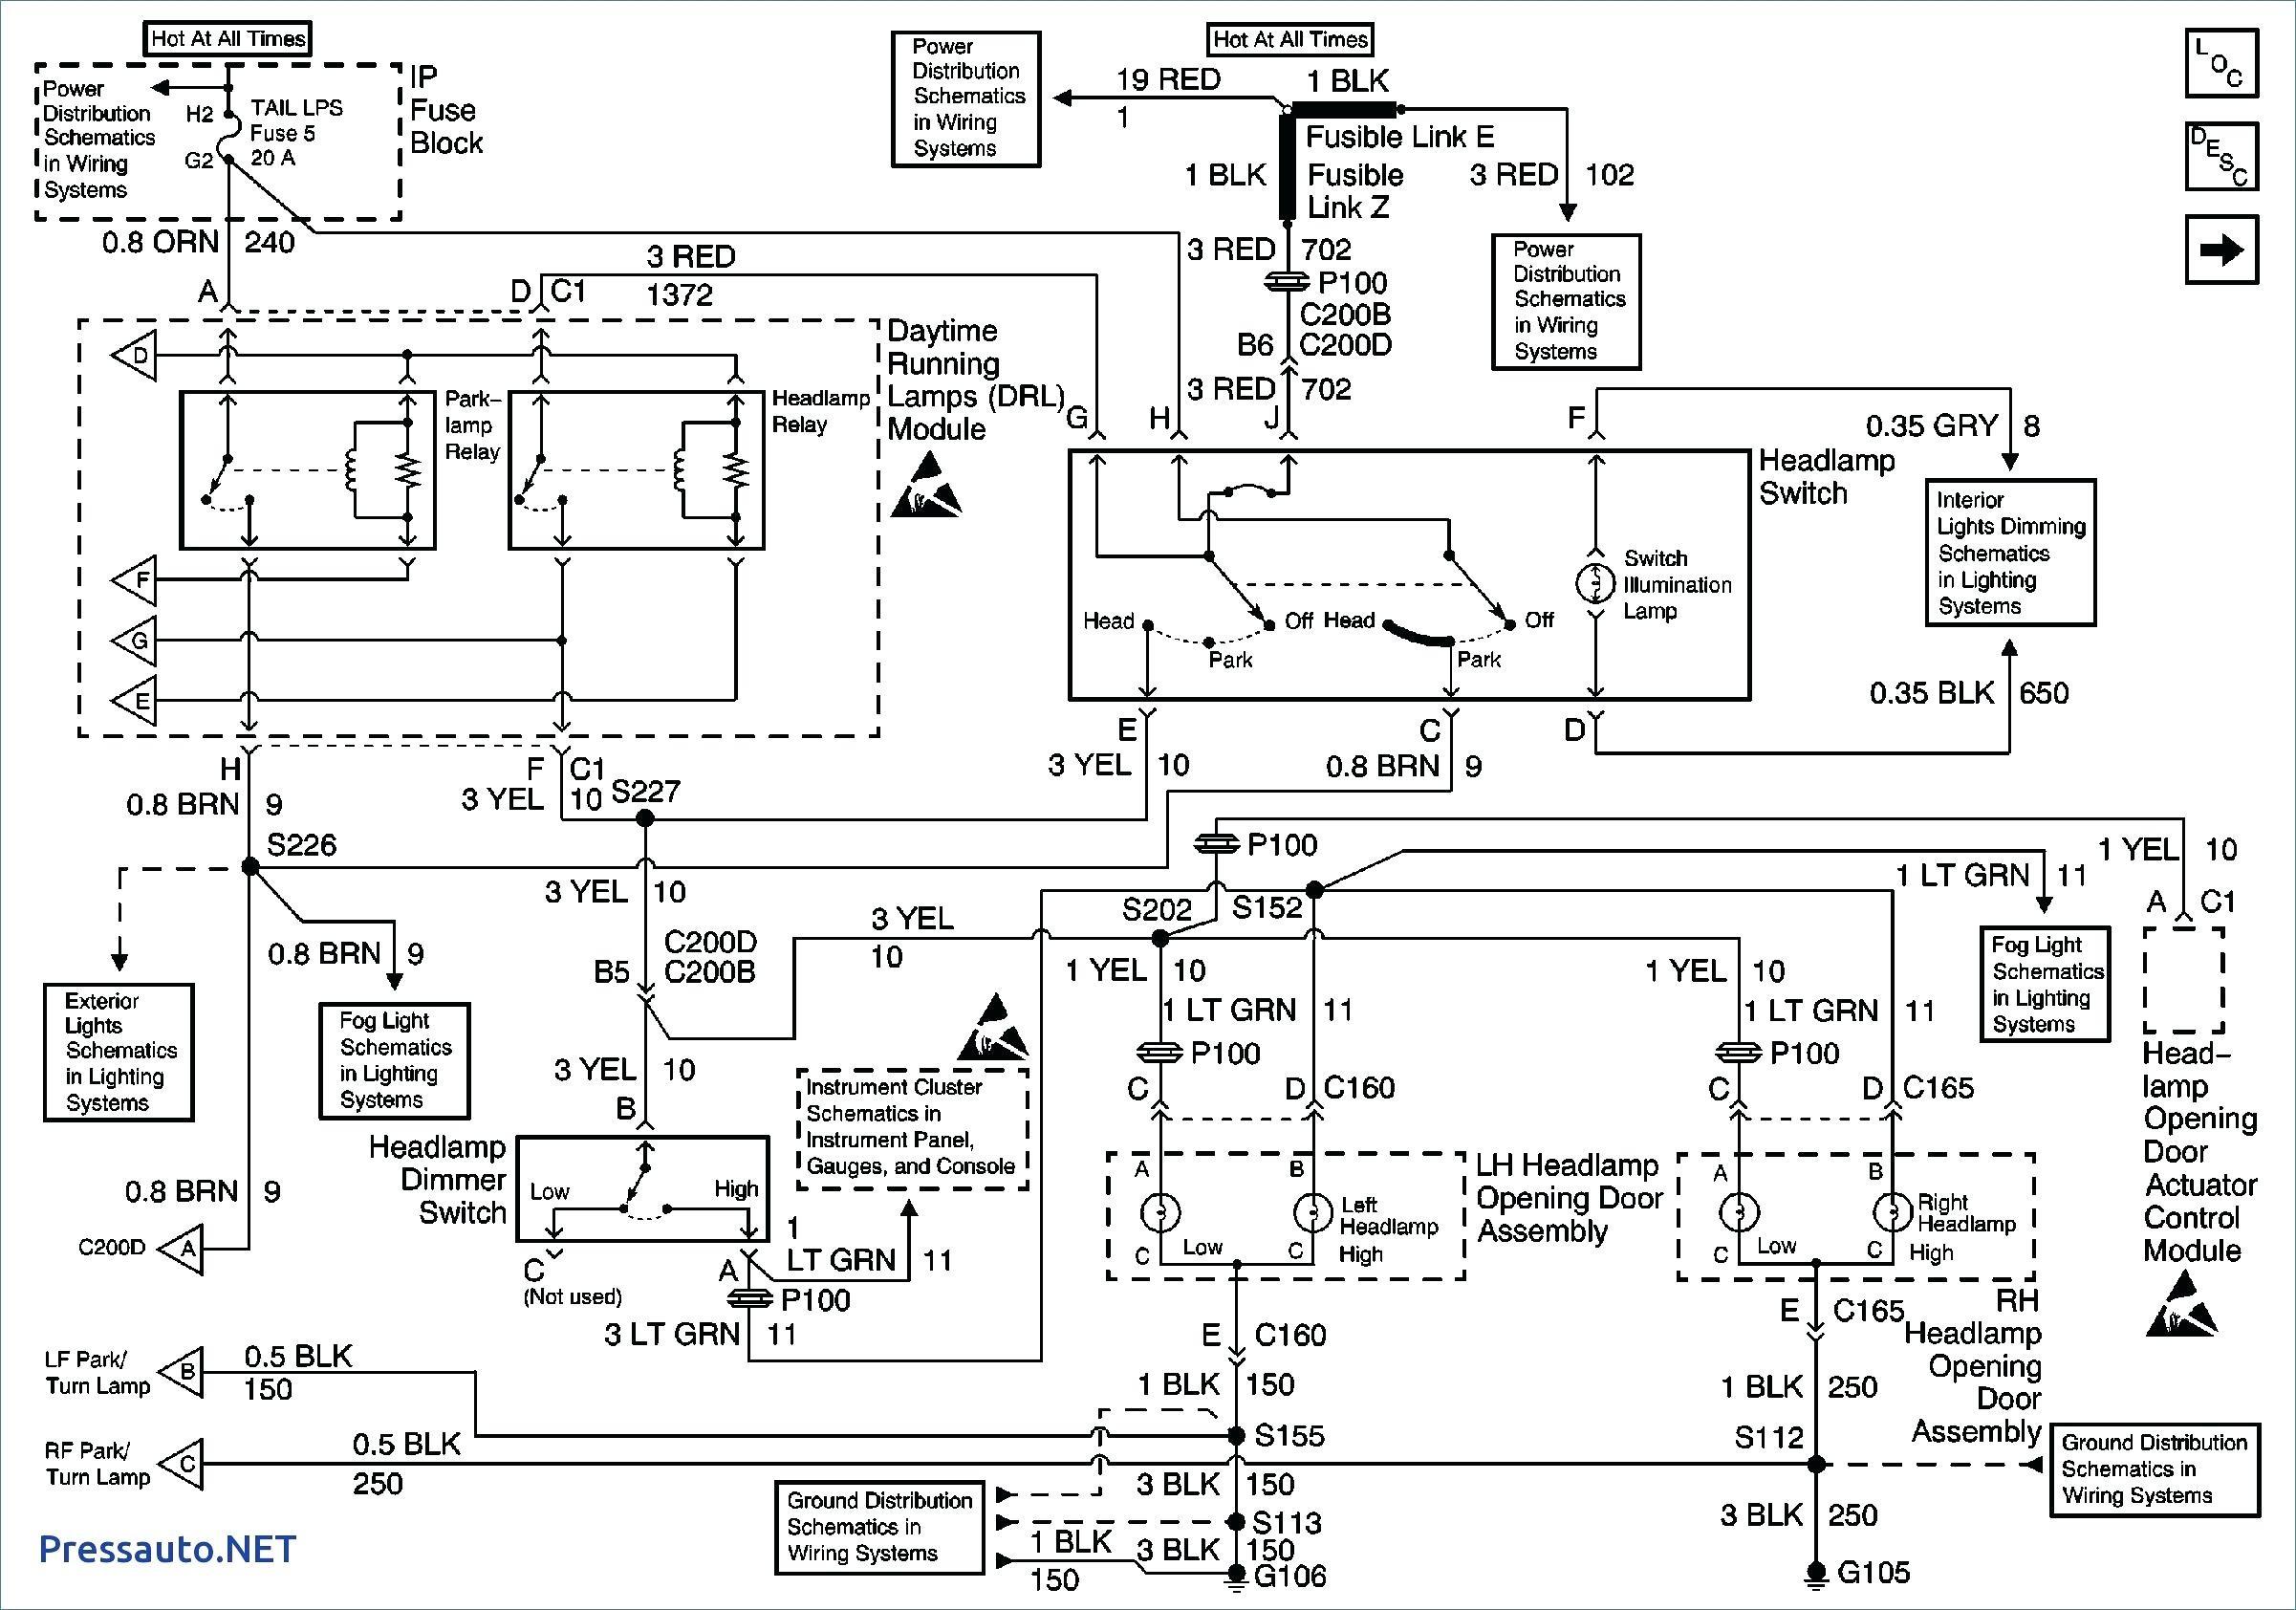 2003 Honda Crv Wiring Diagram Wiring Diagram Ac Honda Crv & 1997 Honda Wiring Diagram Explore Of 2003 Honda Crv Wiring Diagram